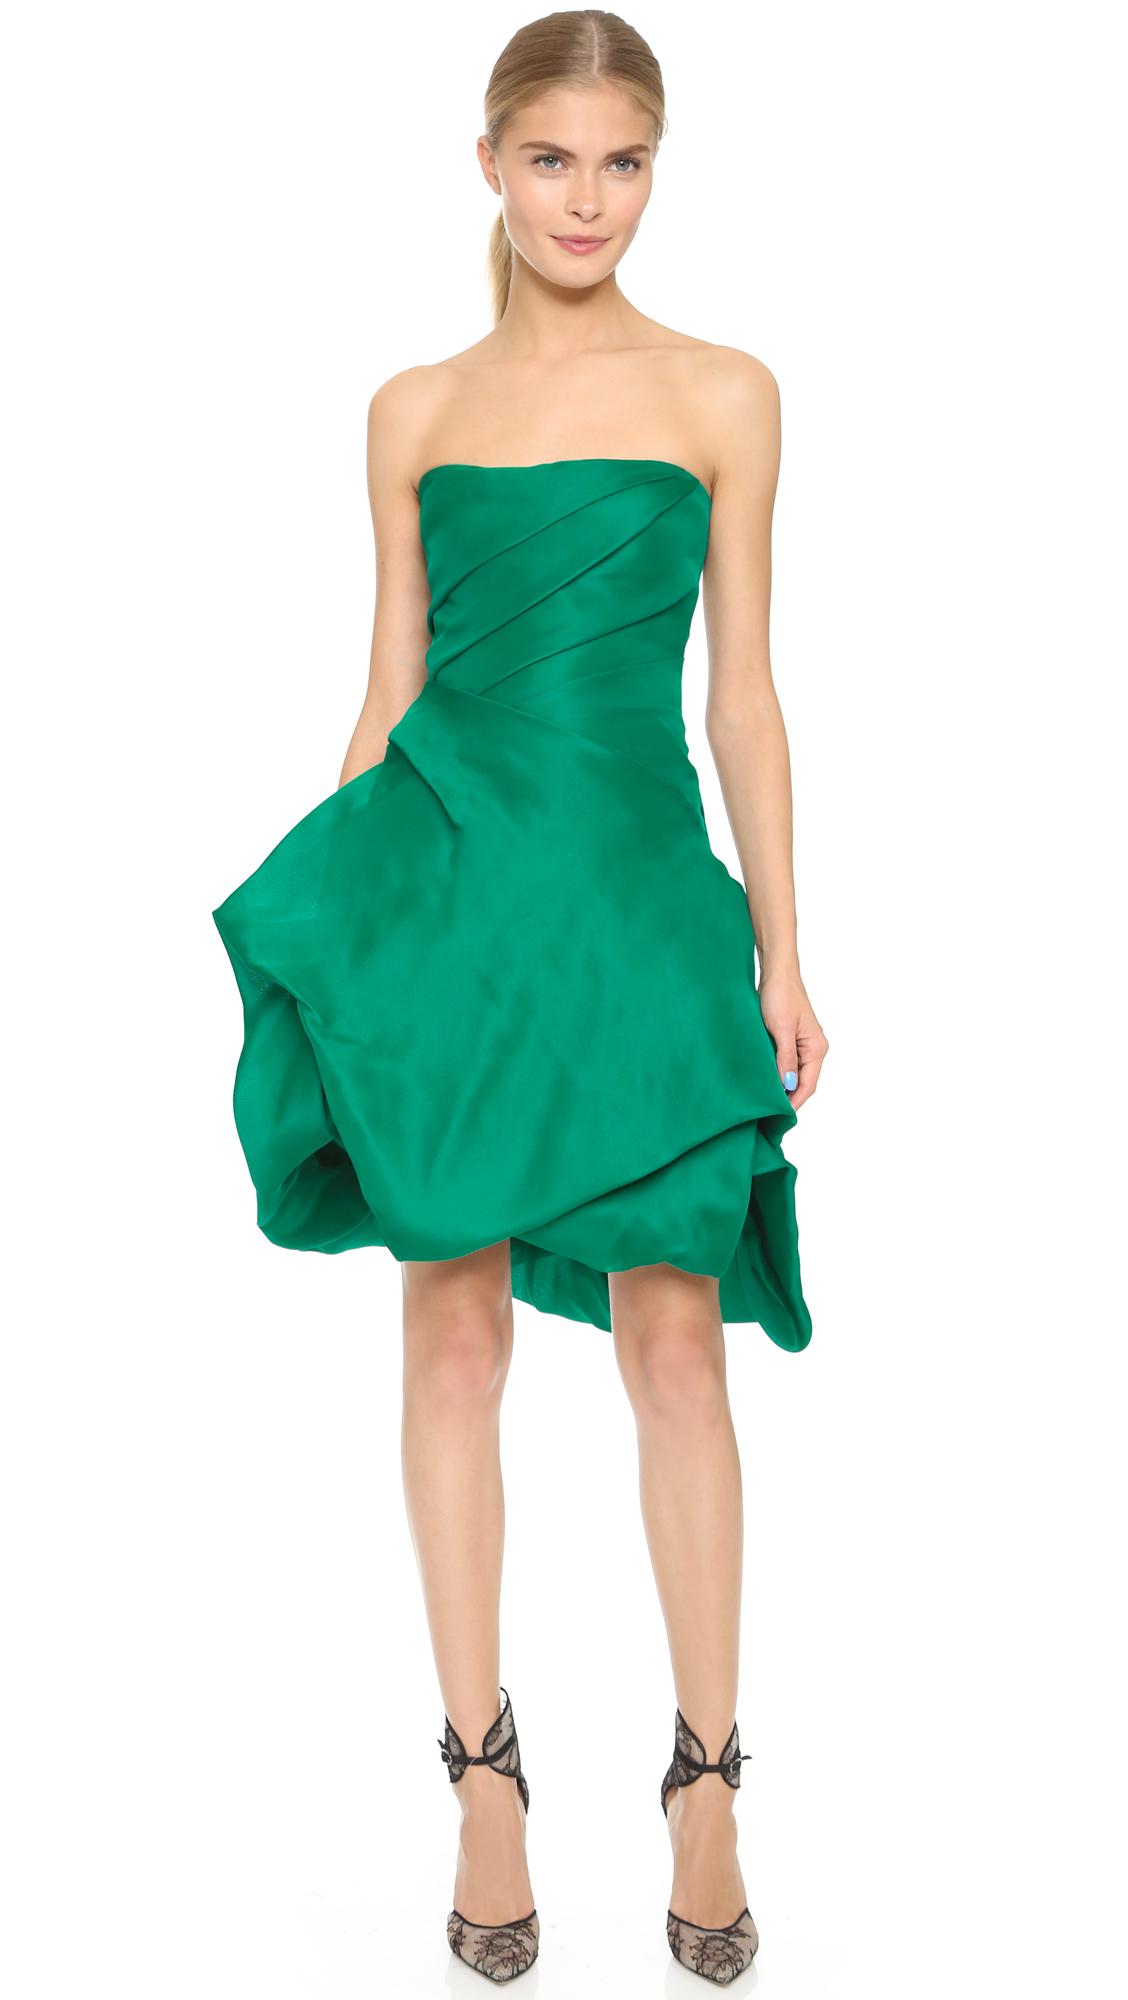 Monique lhuillier Strapless Dress With Bubble Hem - Emerald in ...